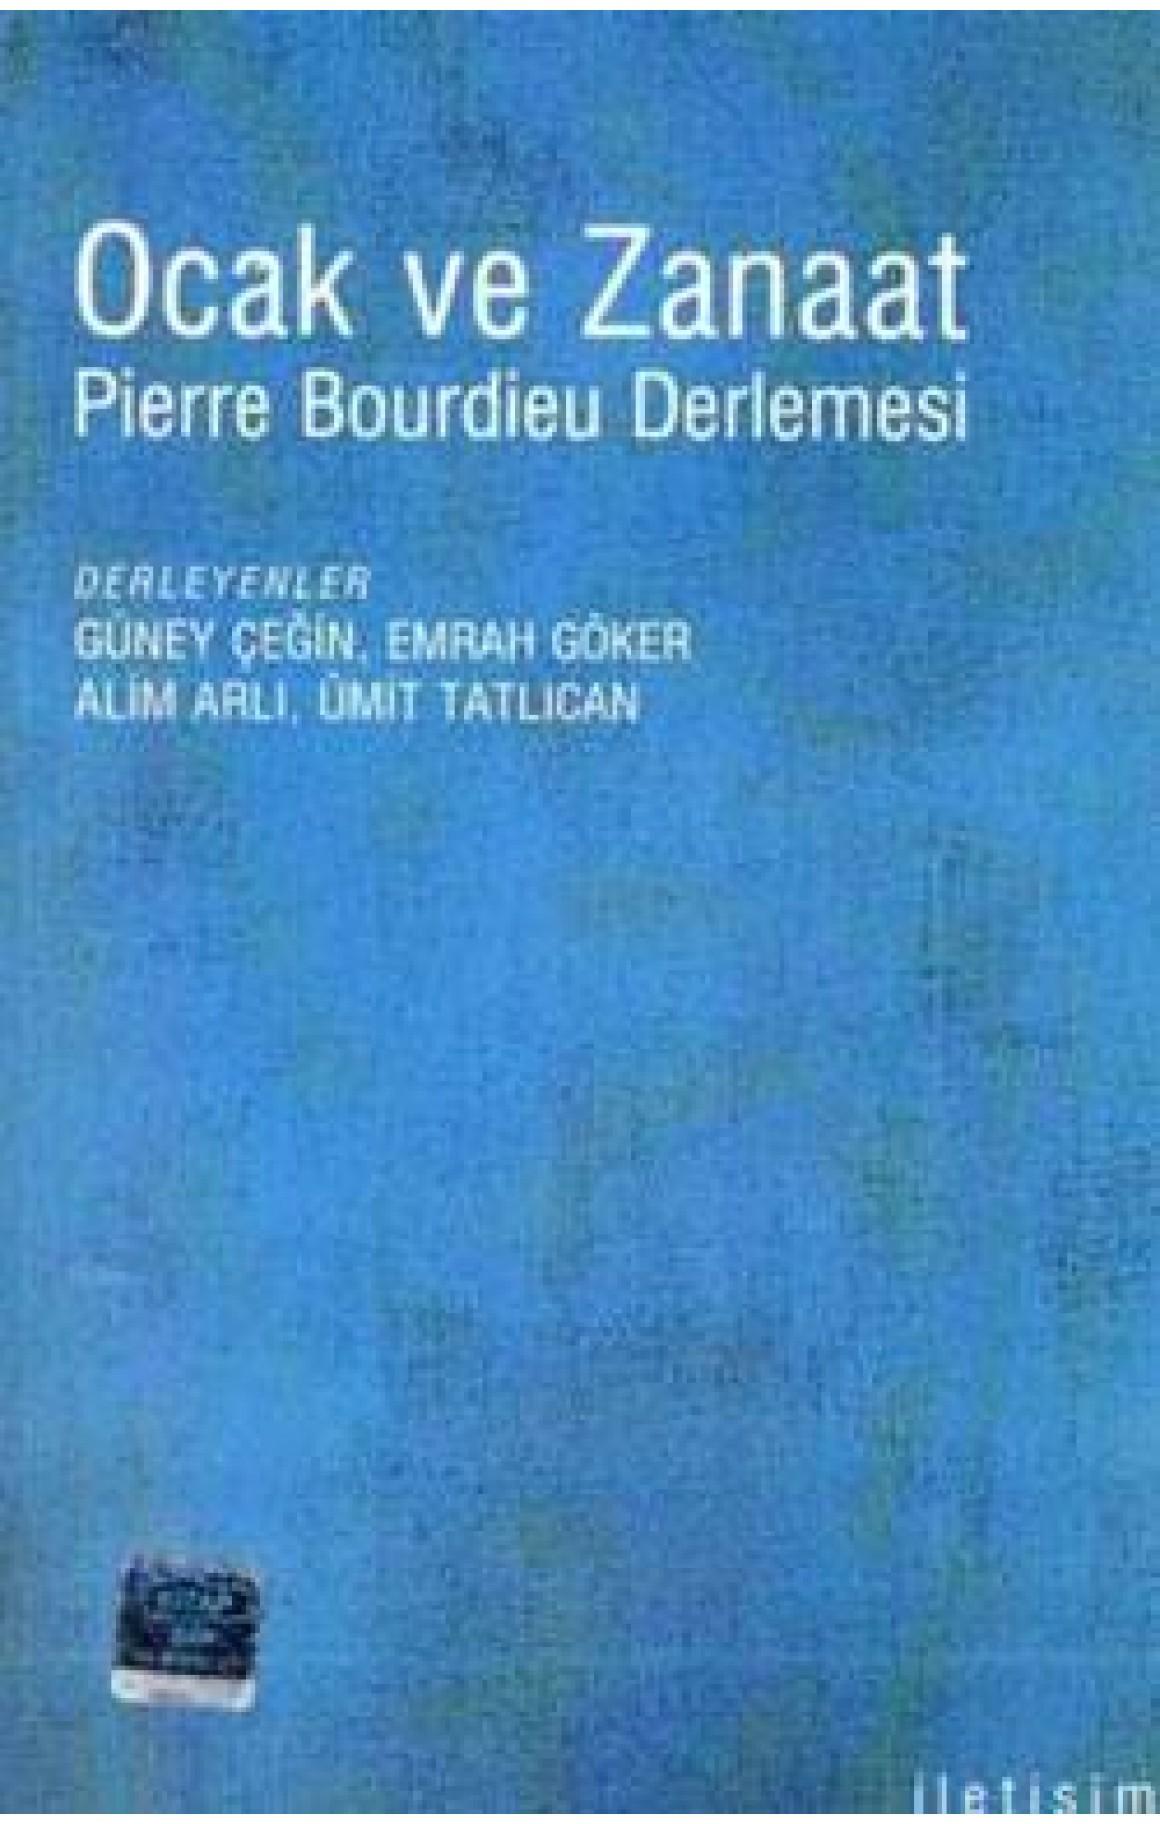 Ocak ve Zanaat - Pierre Bourdieu Derlemesi